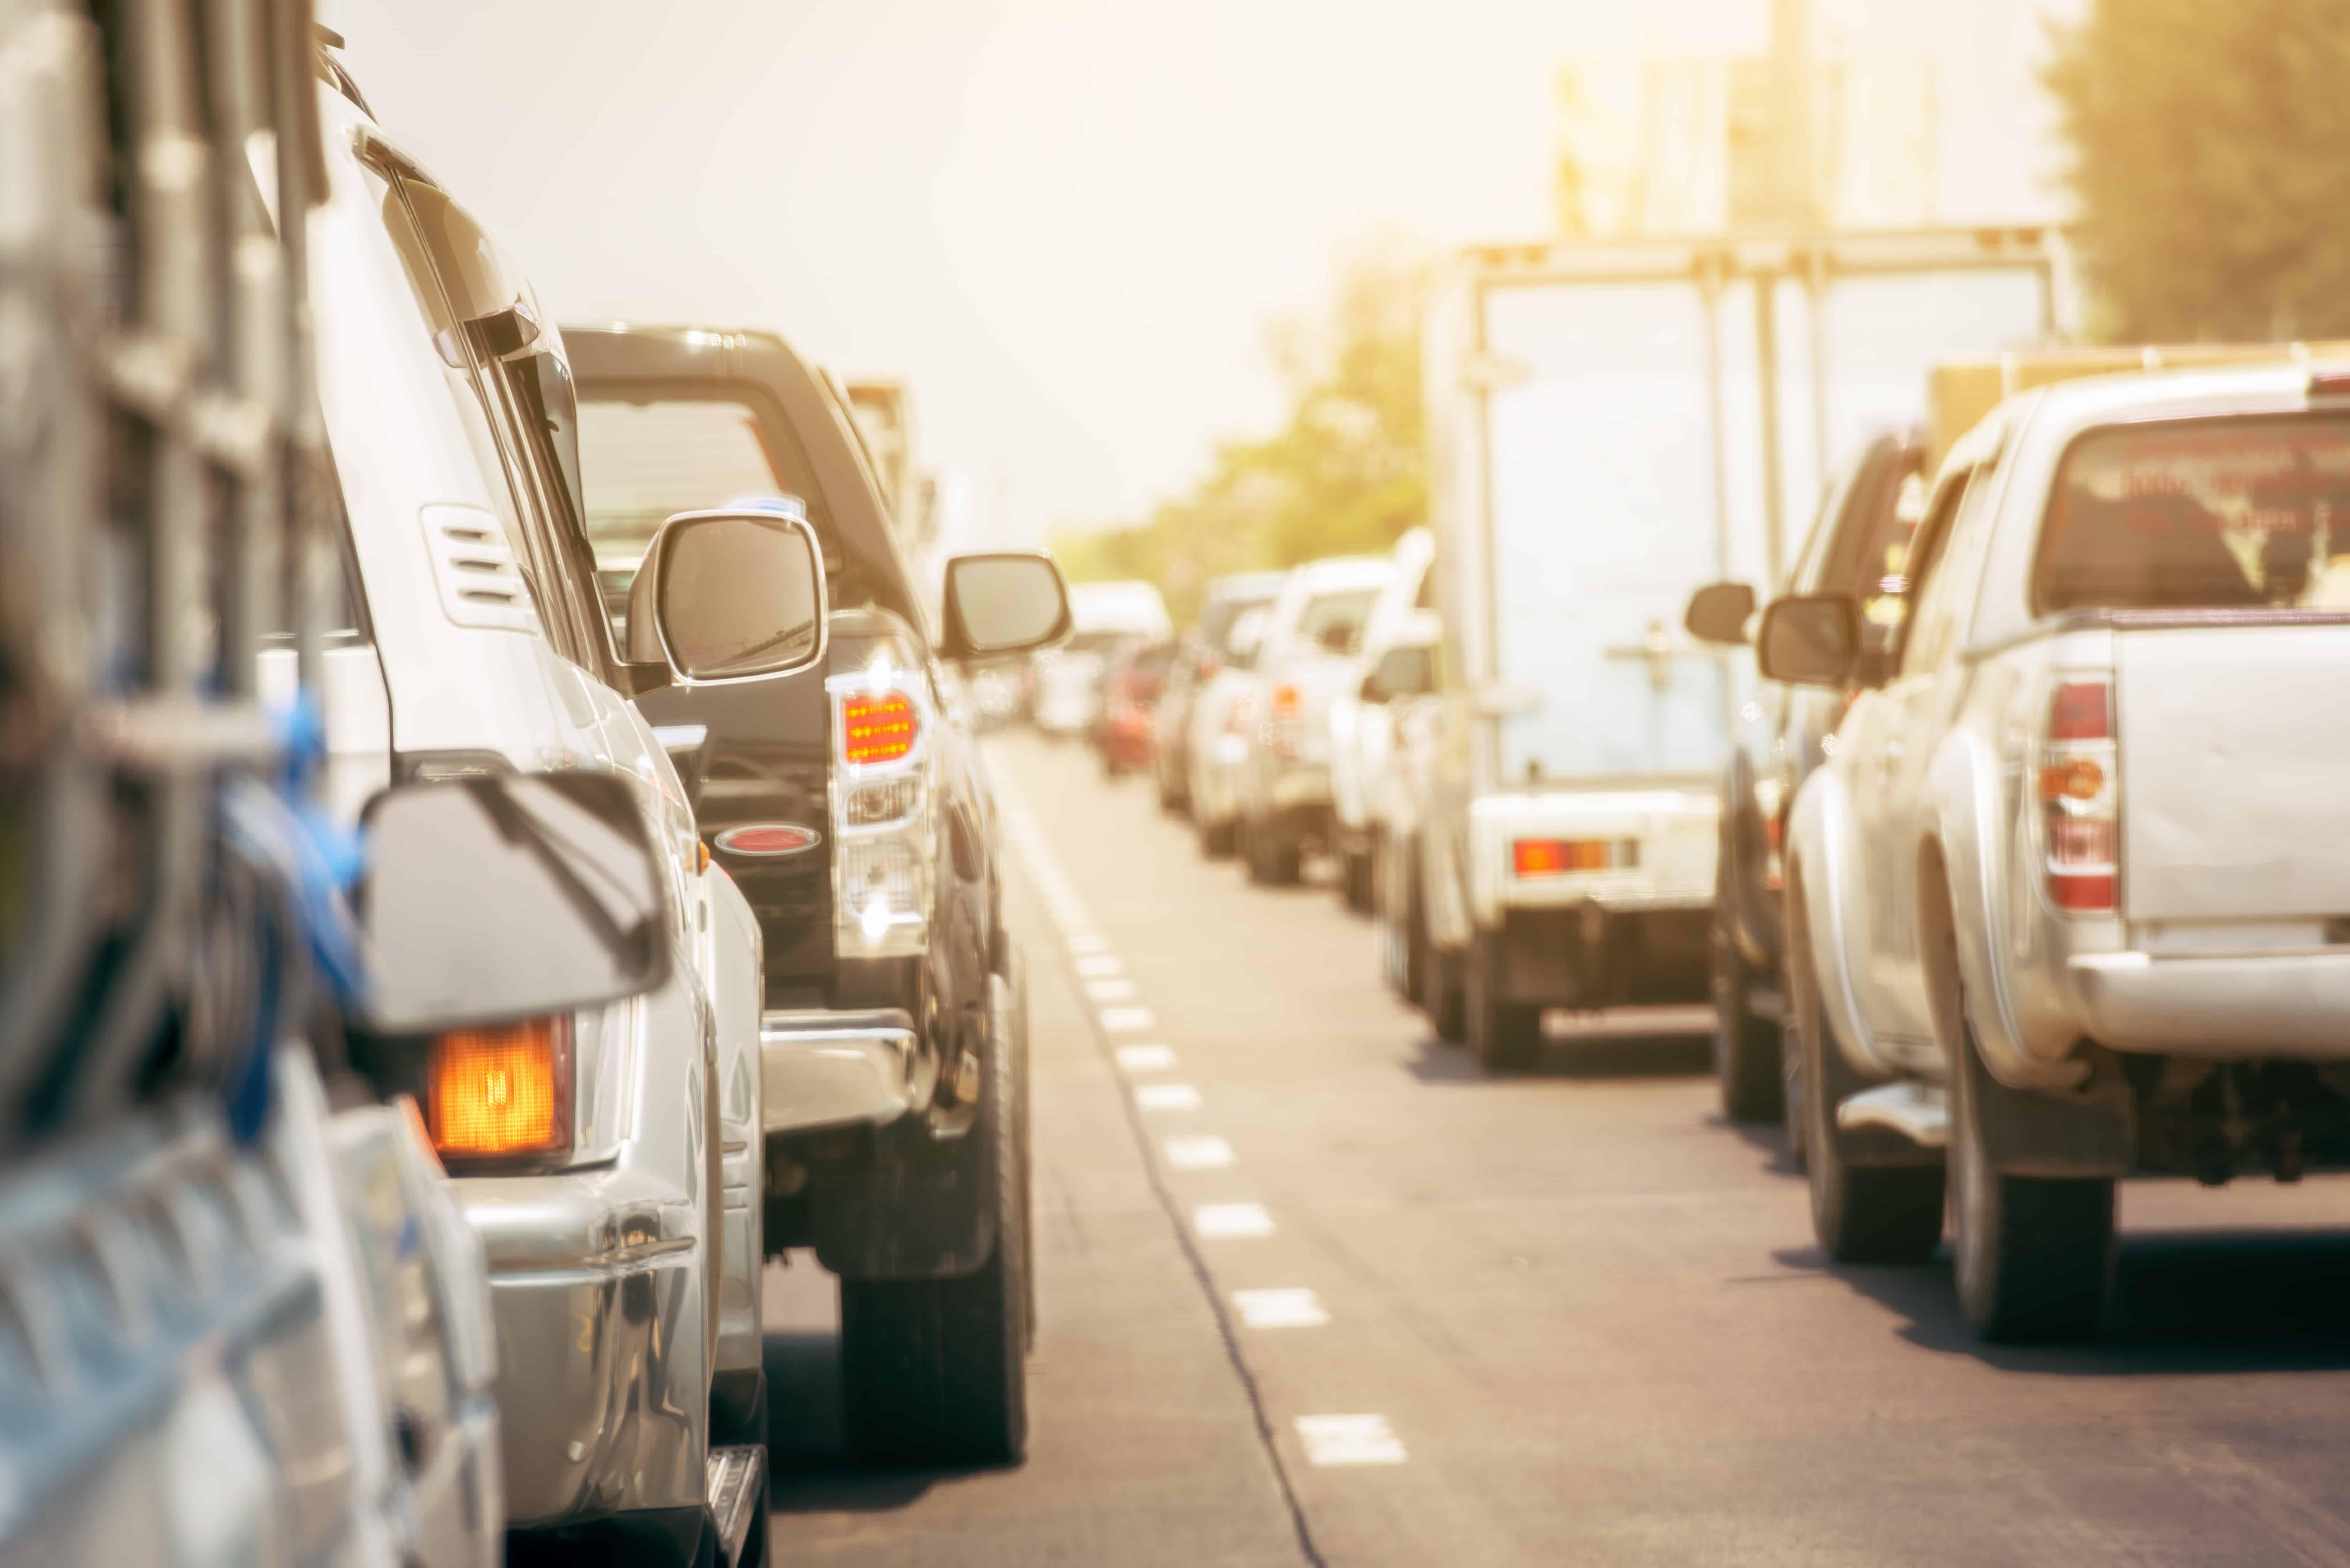 Multi-Vehicle Crash on Interstate 80 near Yerba Buena Island Slows Down Traffic [Oakland, CA]